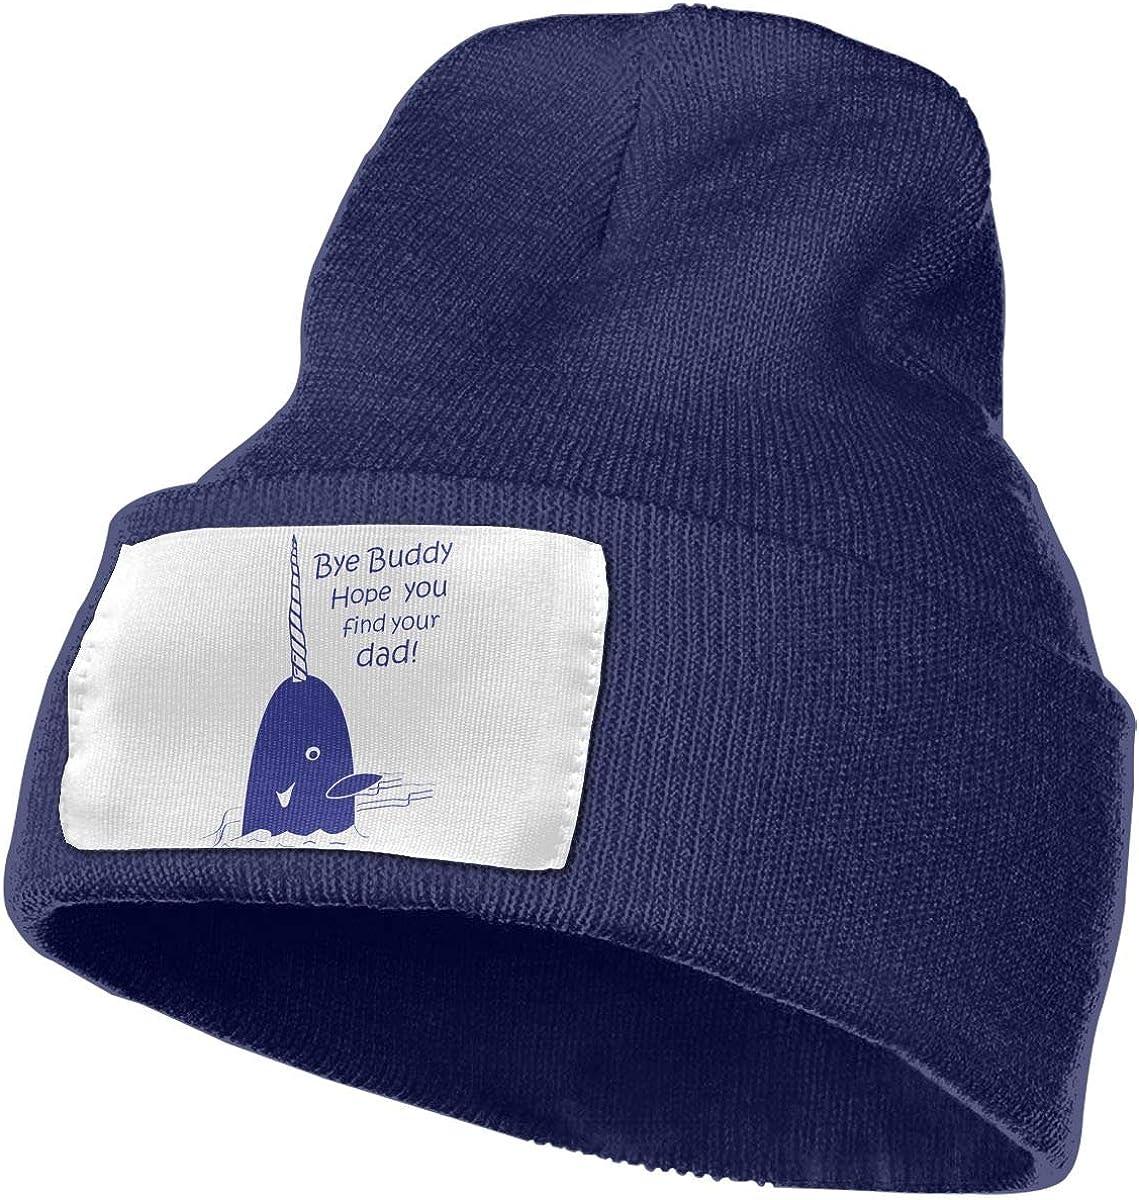 Bye Buddy Hope You Find Your Dad Men/&Women Warm Winter Knit Plain Beanie Hat Skull Cap Acrylic Knit Cuff Hat